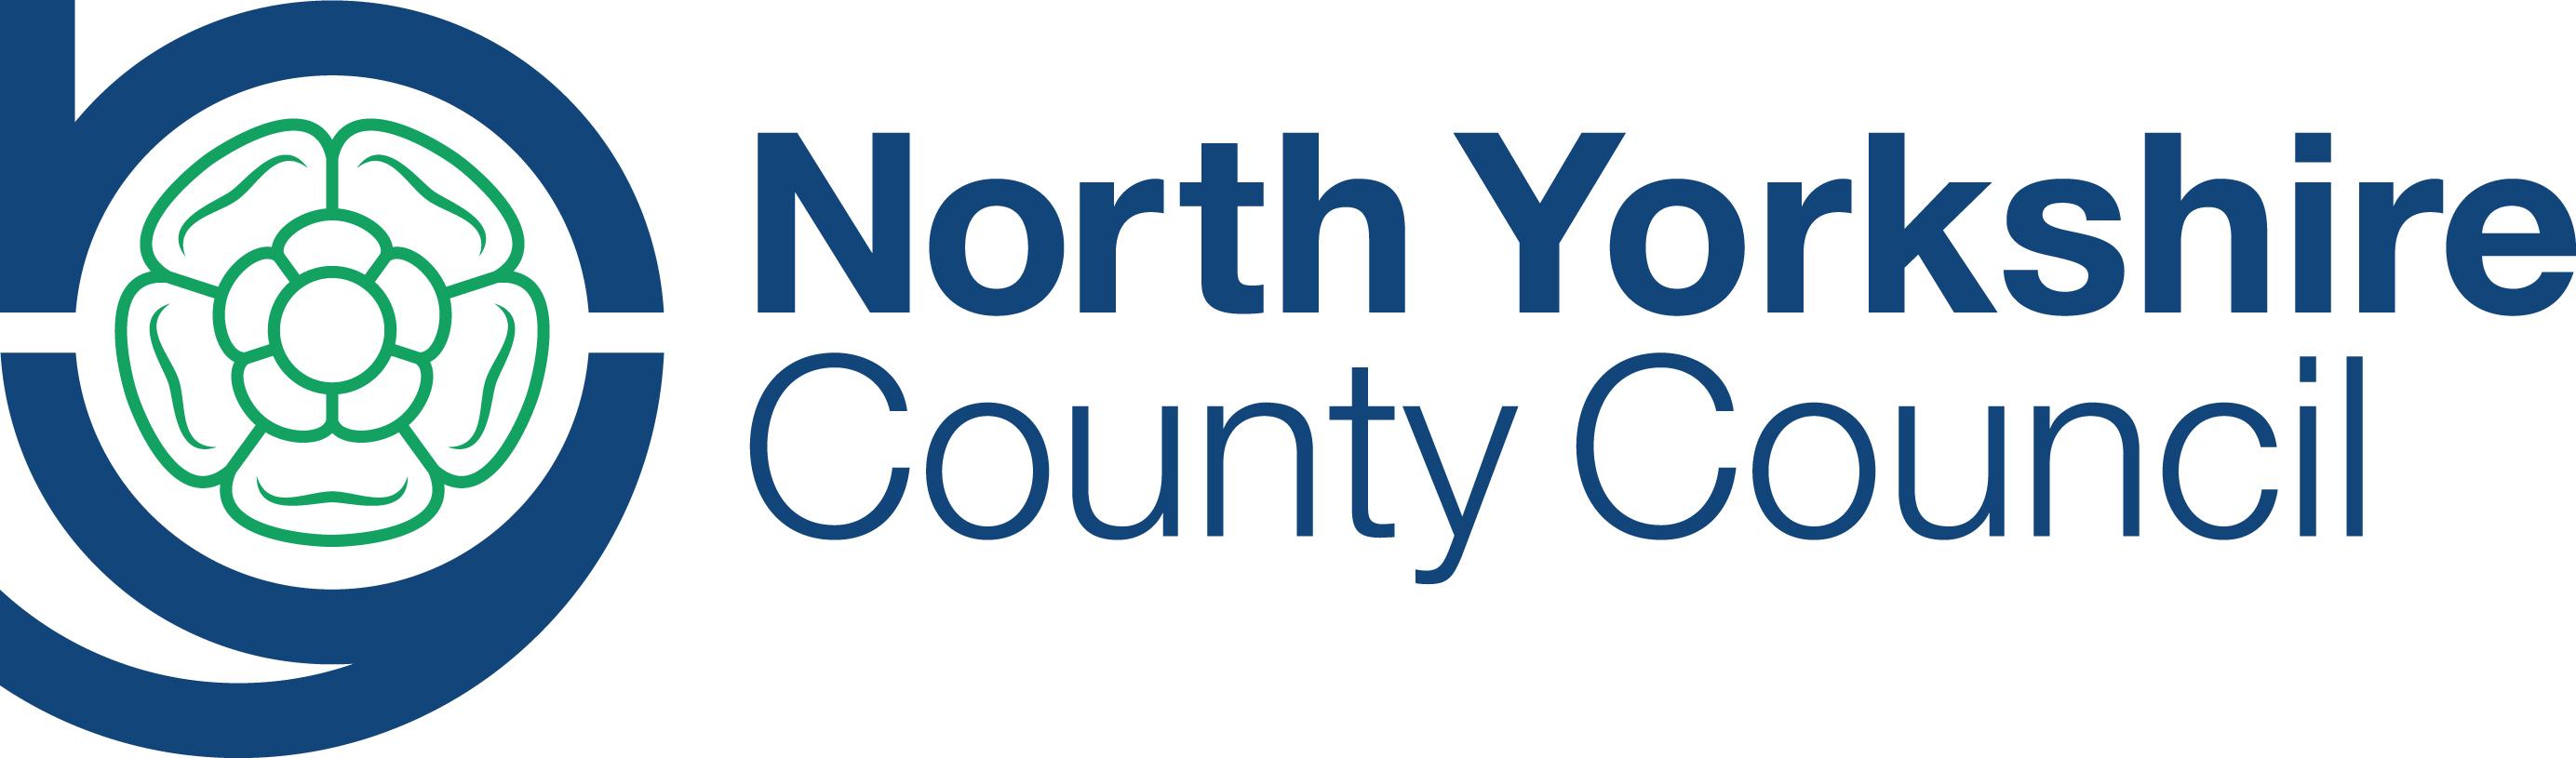 North Yorkshire